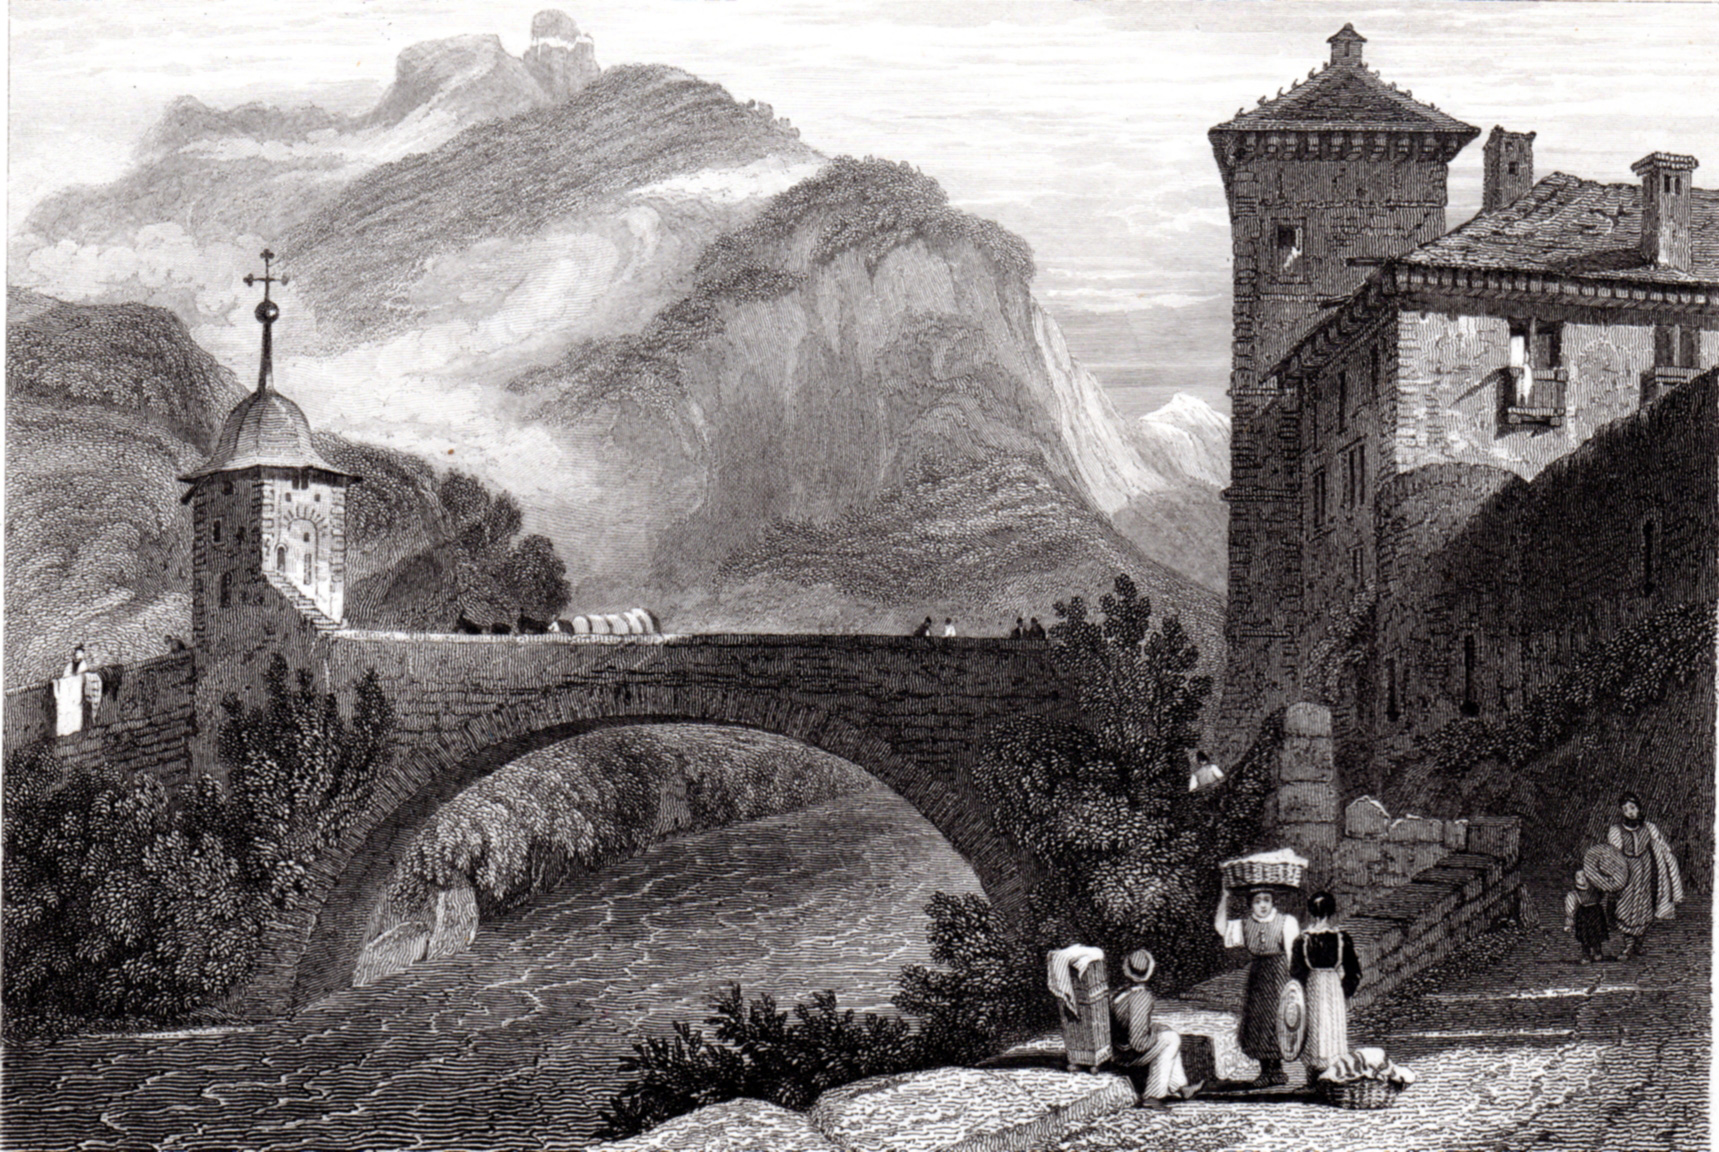 Switzerland misc. antique prints